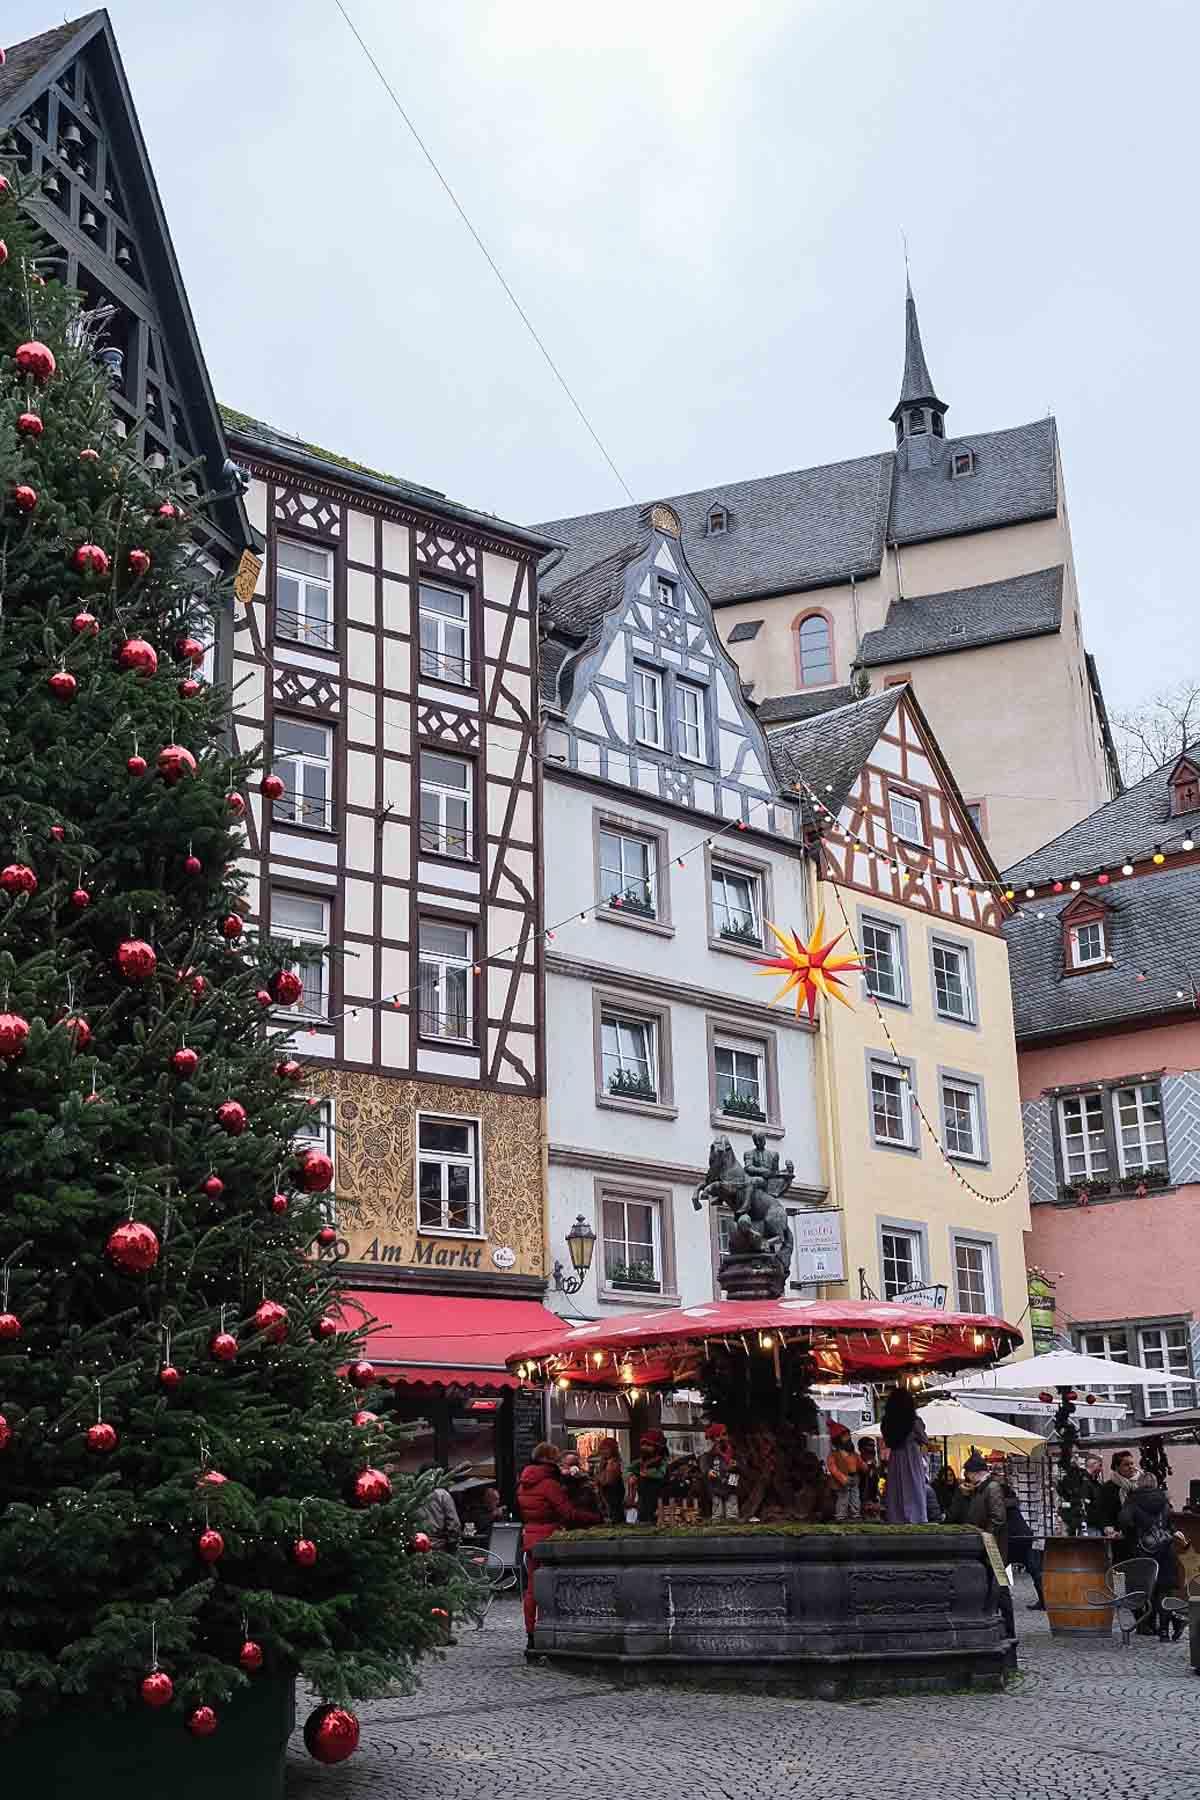 kerstmarkt Cochem, Eifel, Duitsland